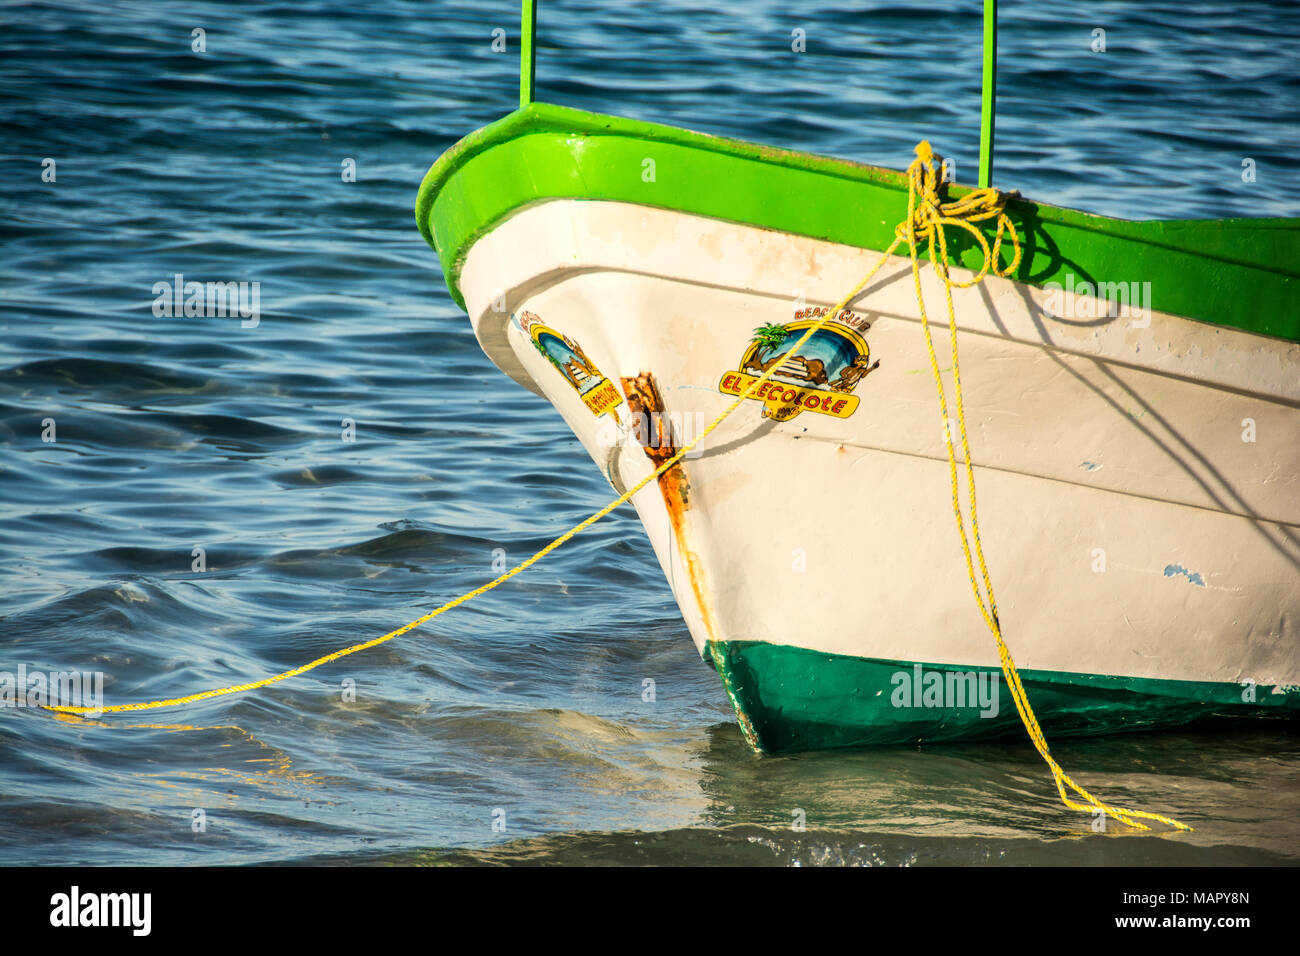 baja beach chairs santa chair covers dollar tree panga boat stock photos and images alamy